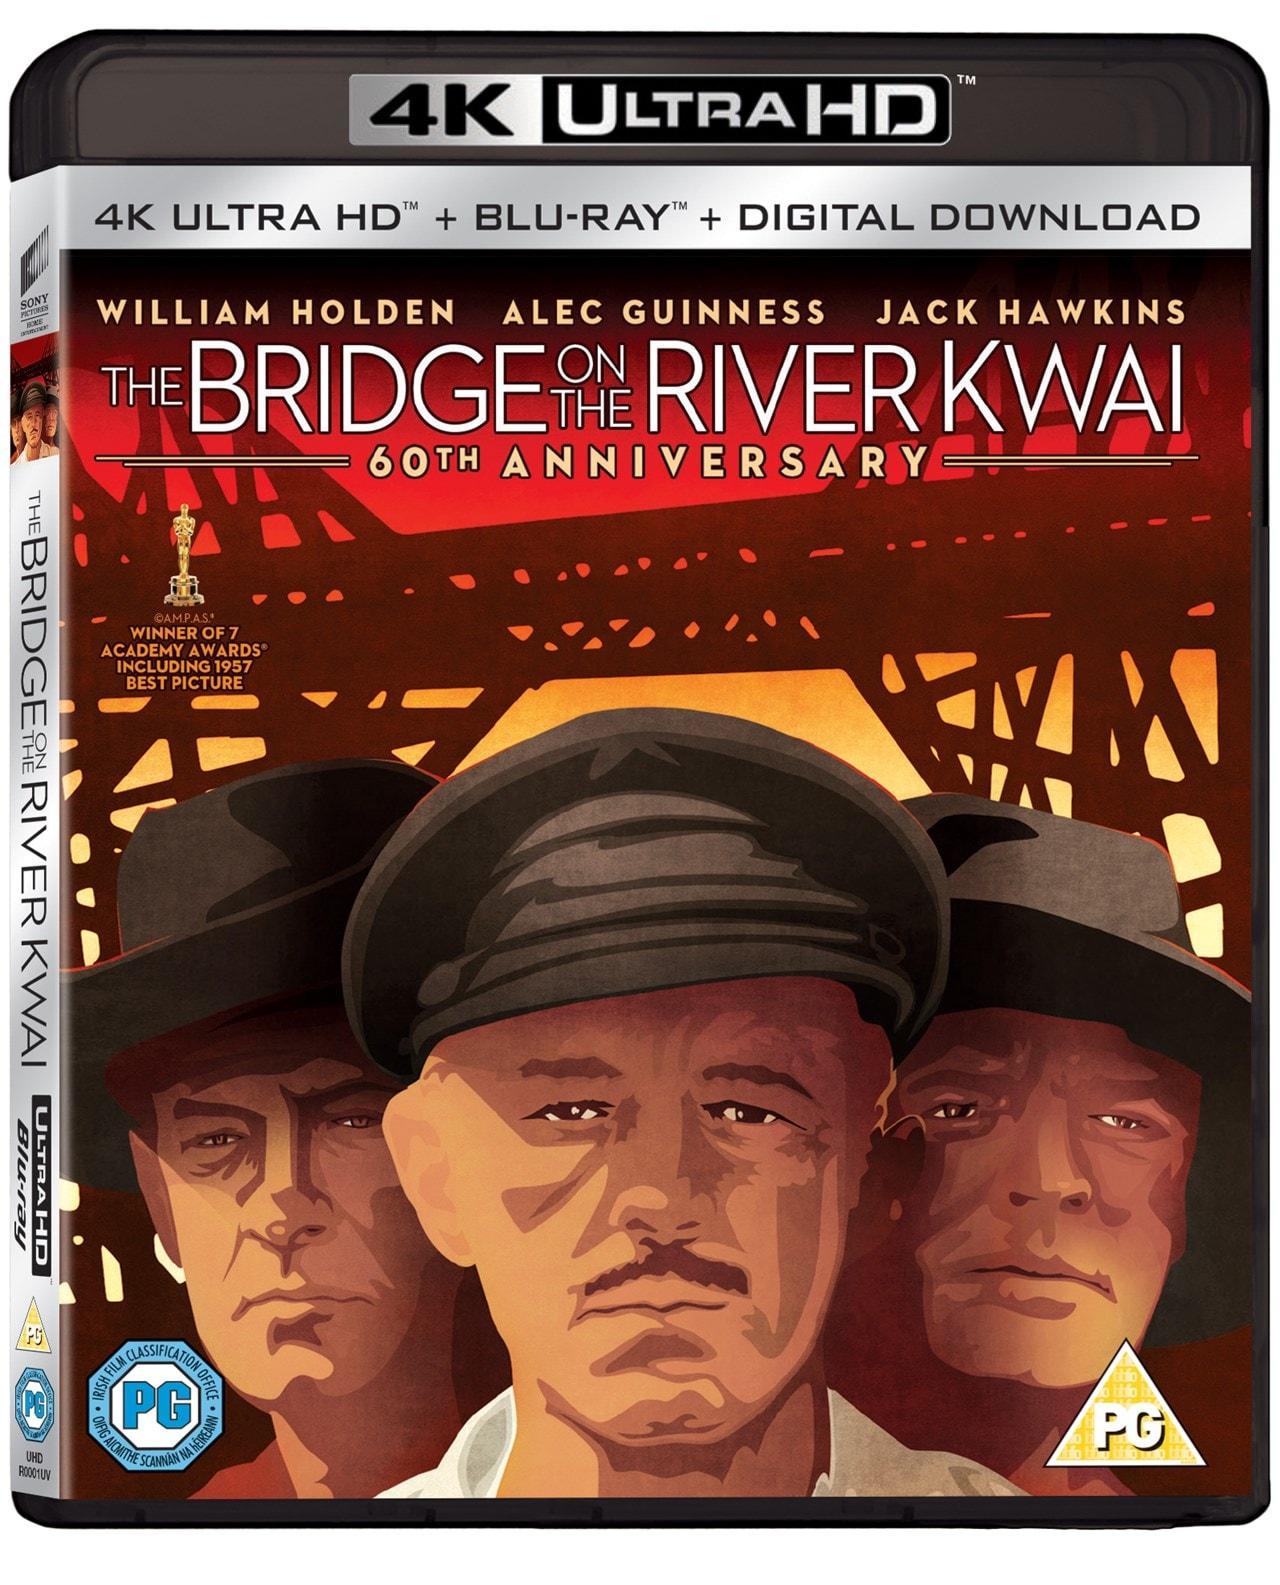 The Bridge On the River Kwai - 2